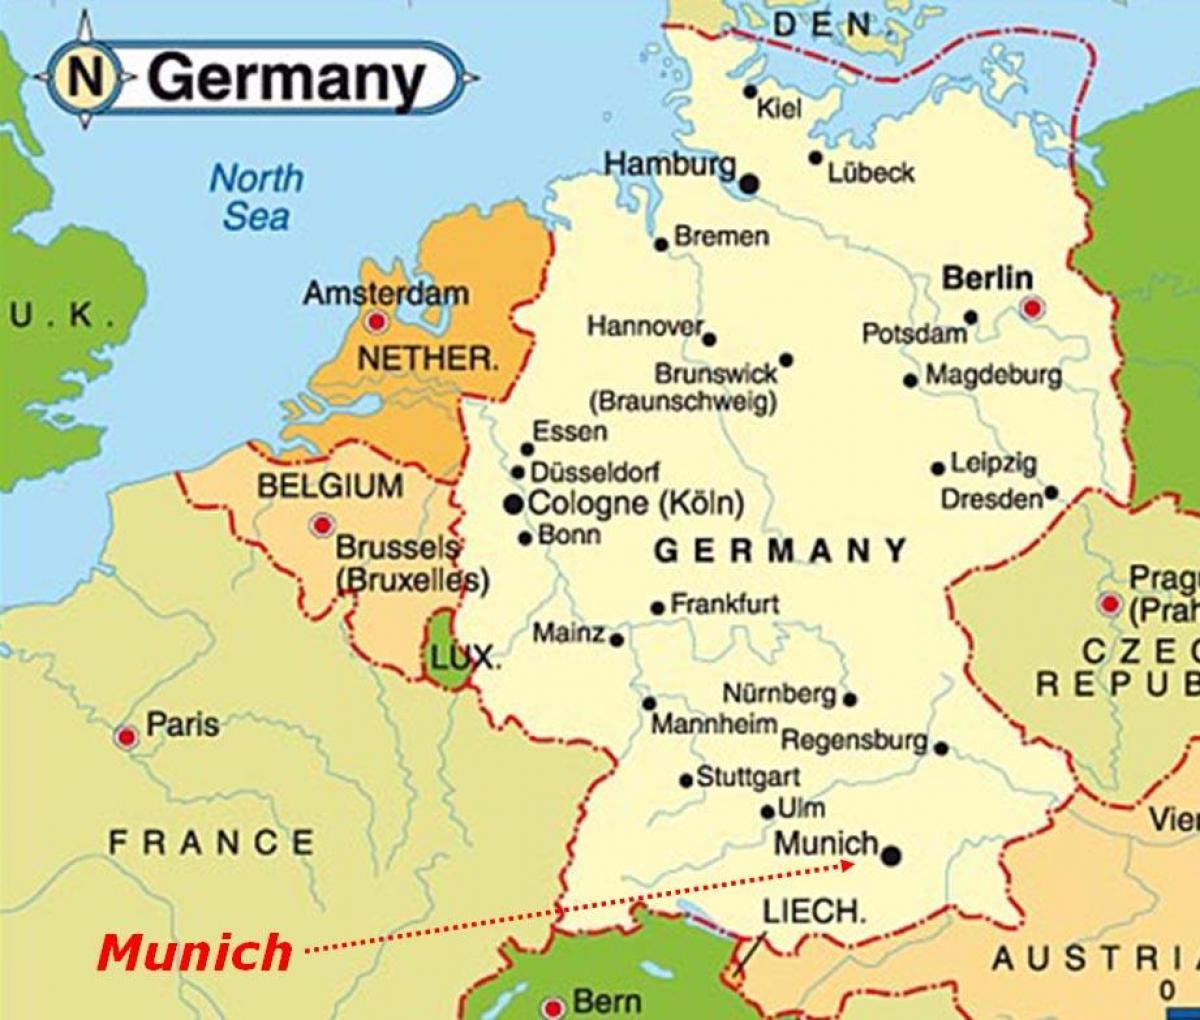 Myunhen Karta Evropy Karta Myunhena Evrope Bavariya Germaniya